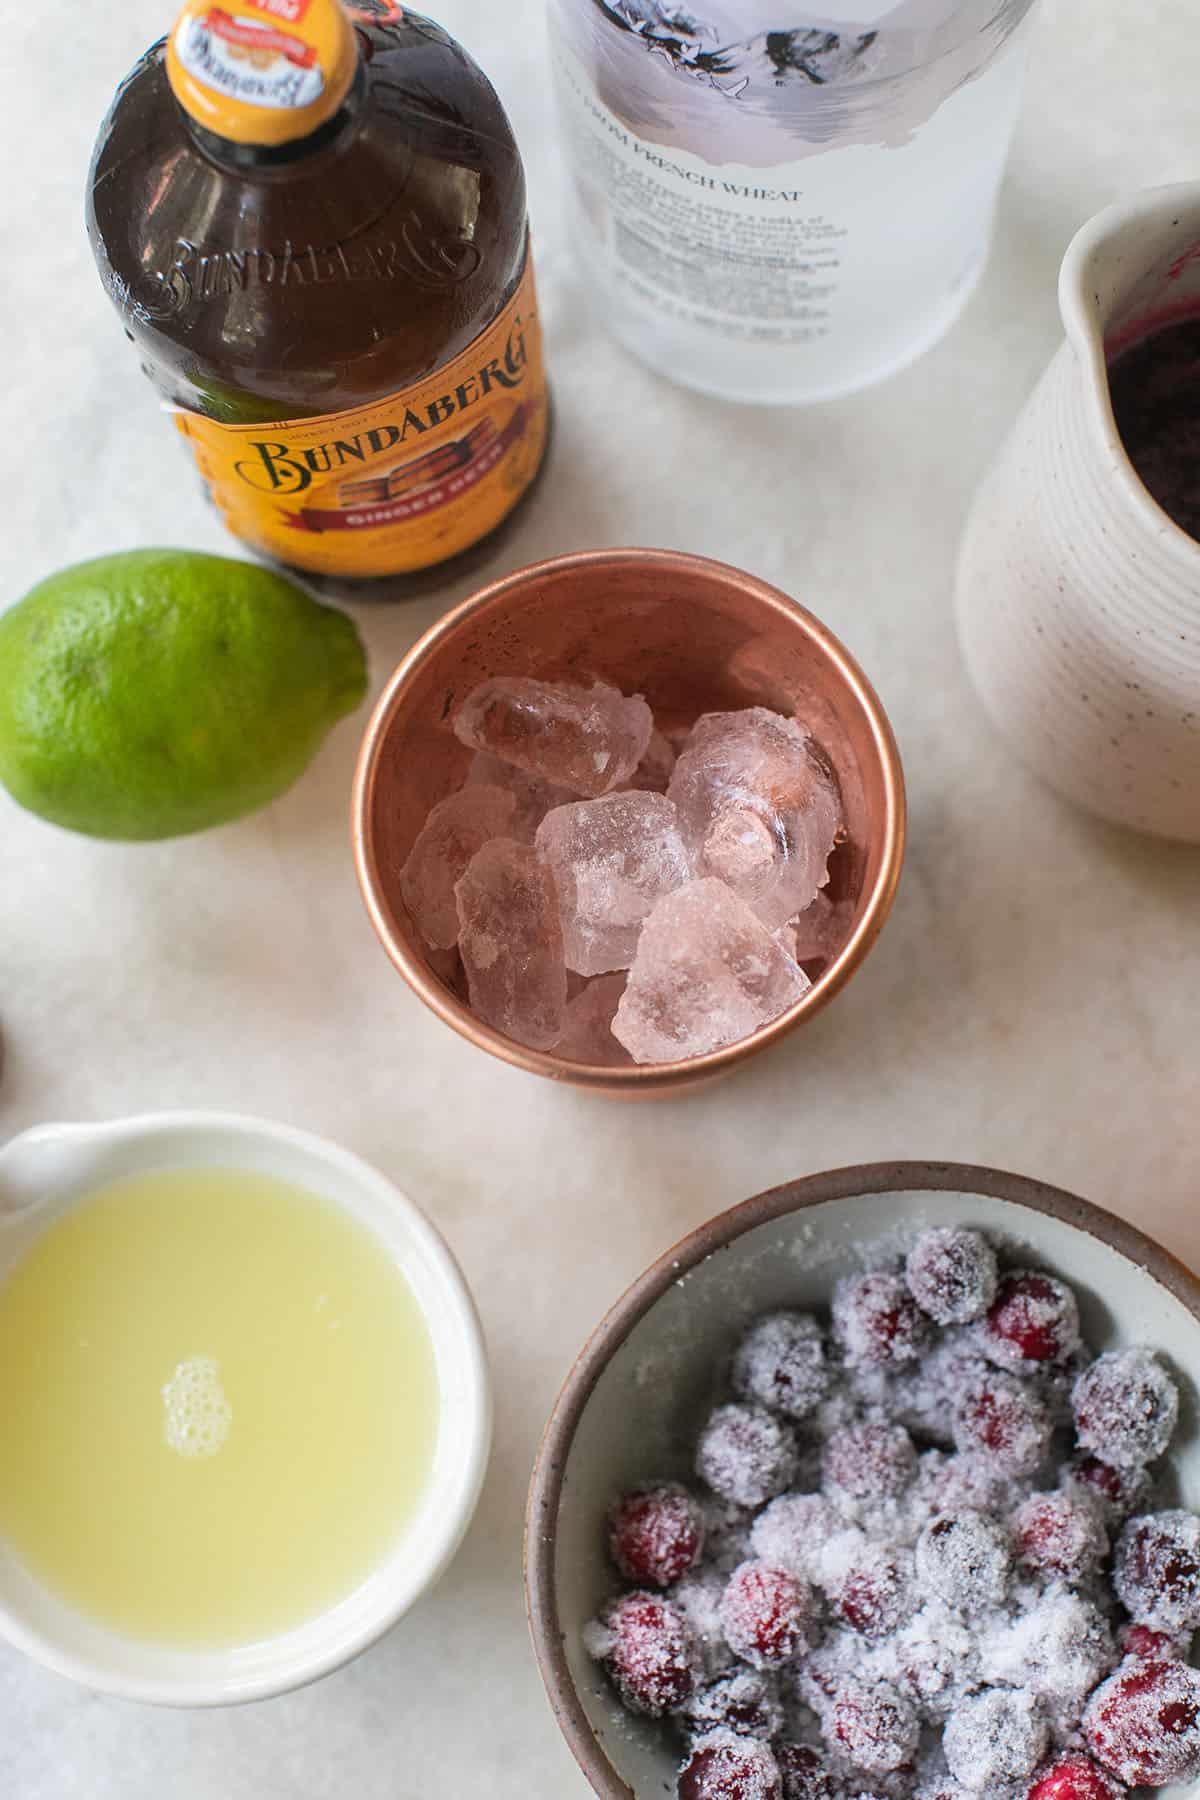 ginger beer, lime juice, vodka, sugared cranberries and a copper mug